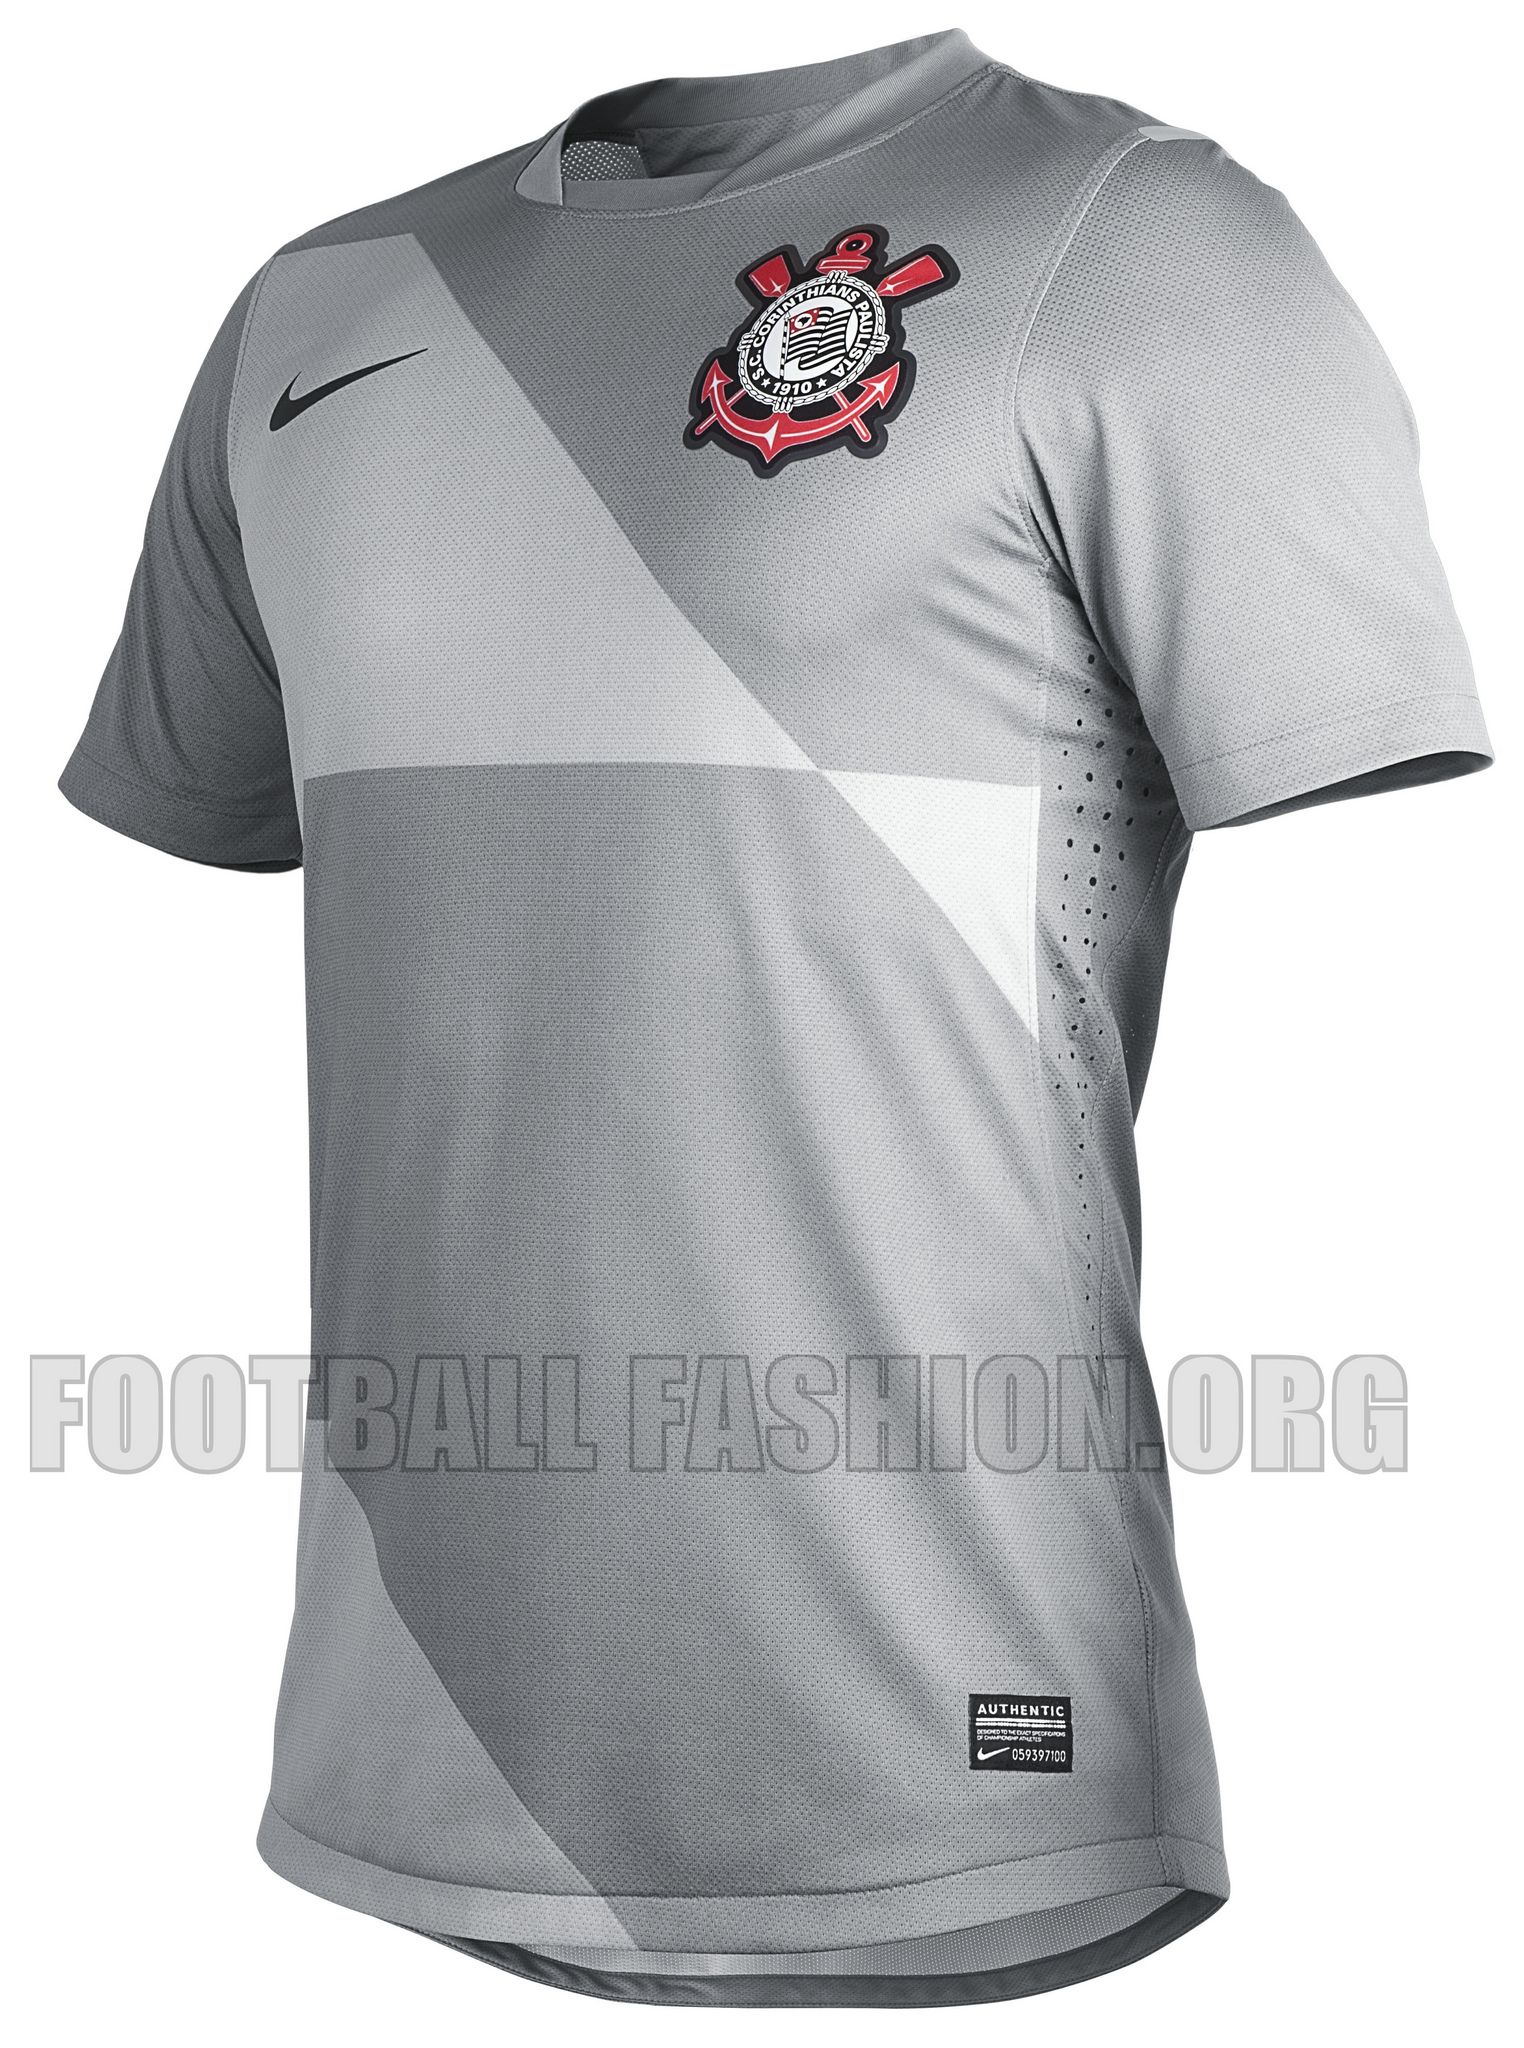 Corinthians Paulista Nike 2012 Third Jersey  209f73dc4